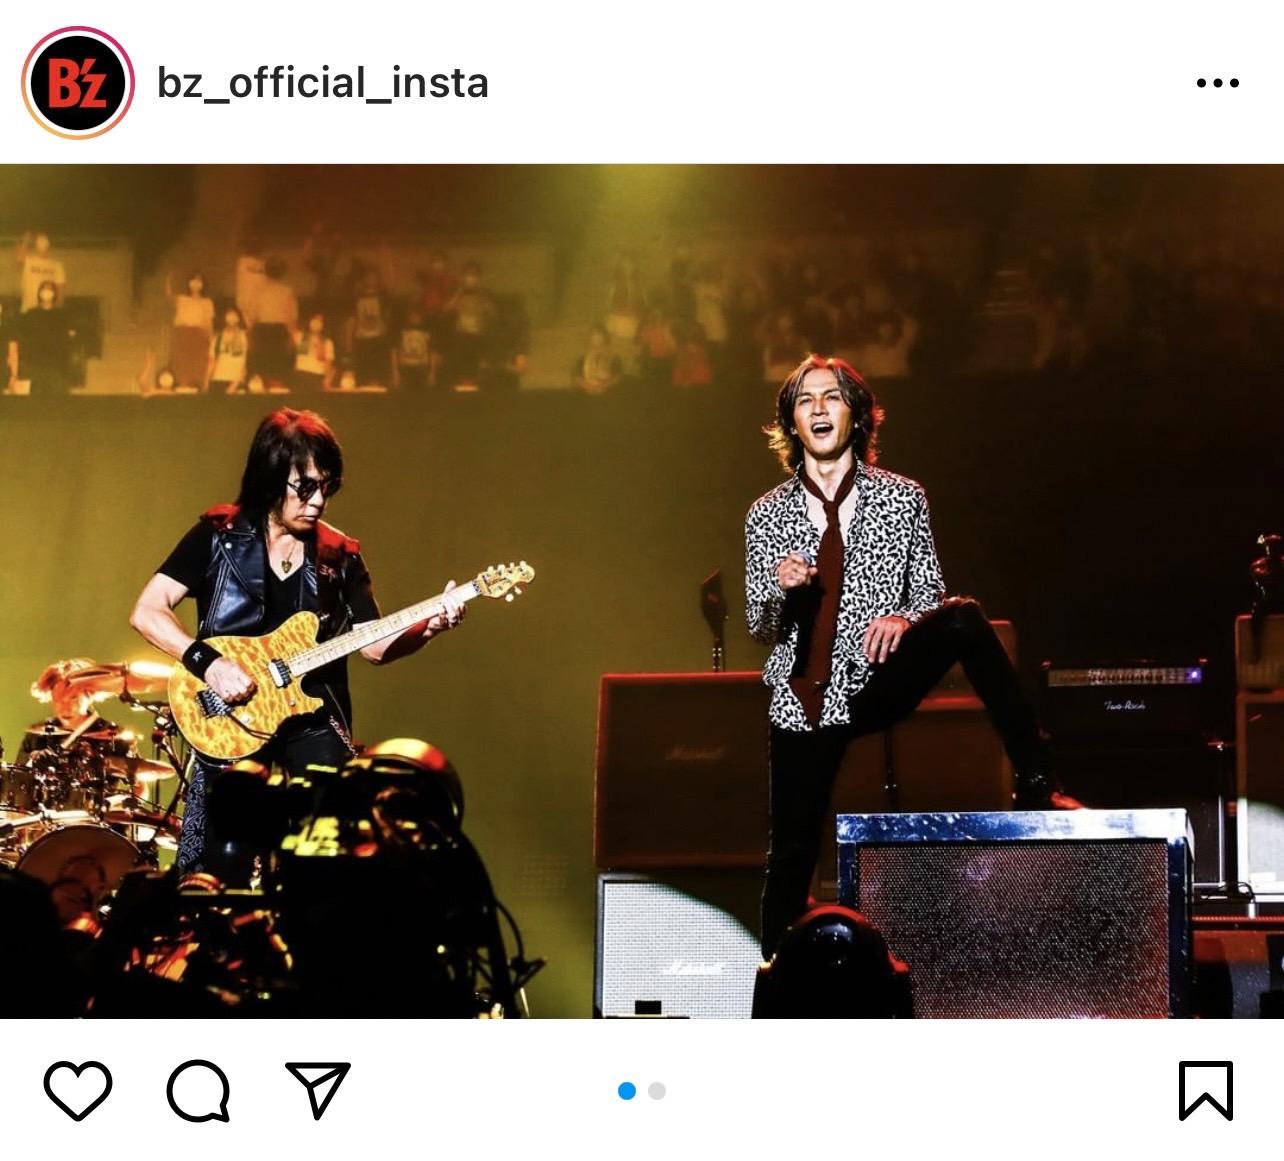 B'z公式Instagramで公開された『B'z presents UNITE #01』横浜公演のステージ写真(左:ギター・松本孝弘 右:ヴォーカル・稲葉浩志)